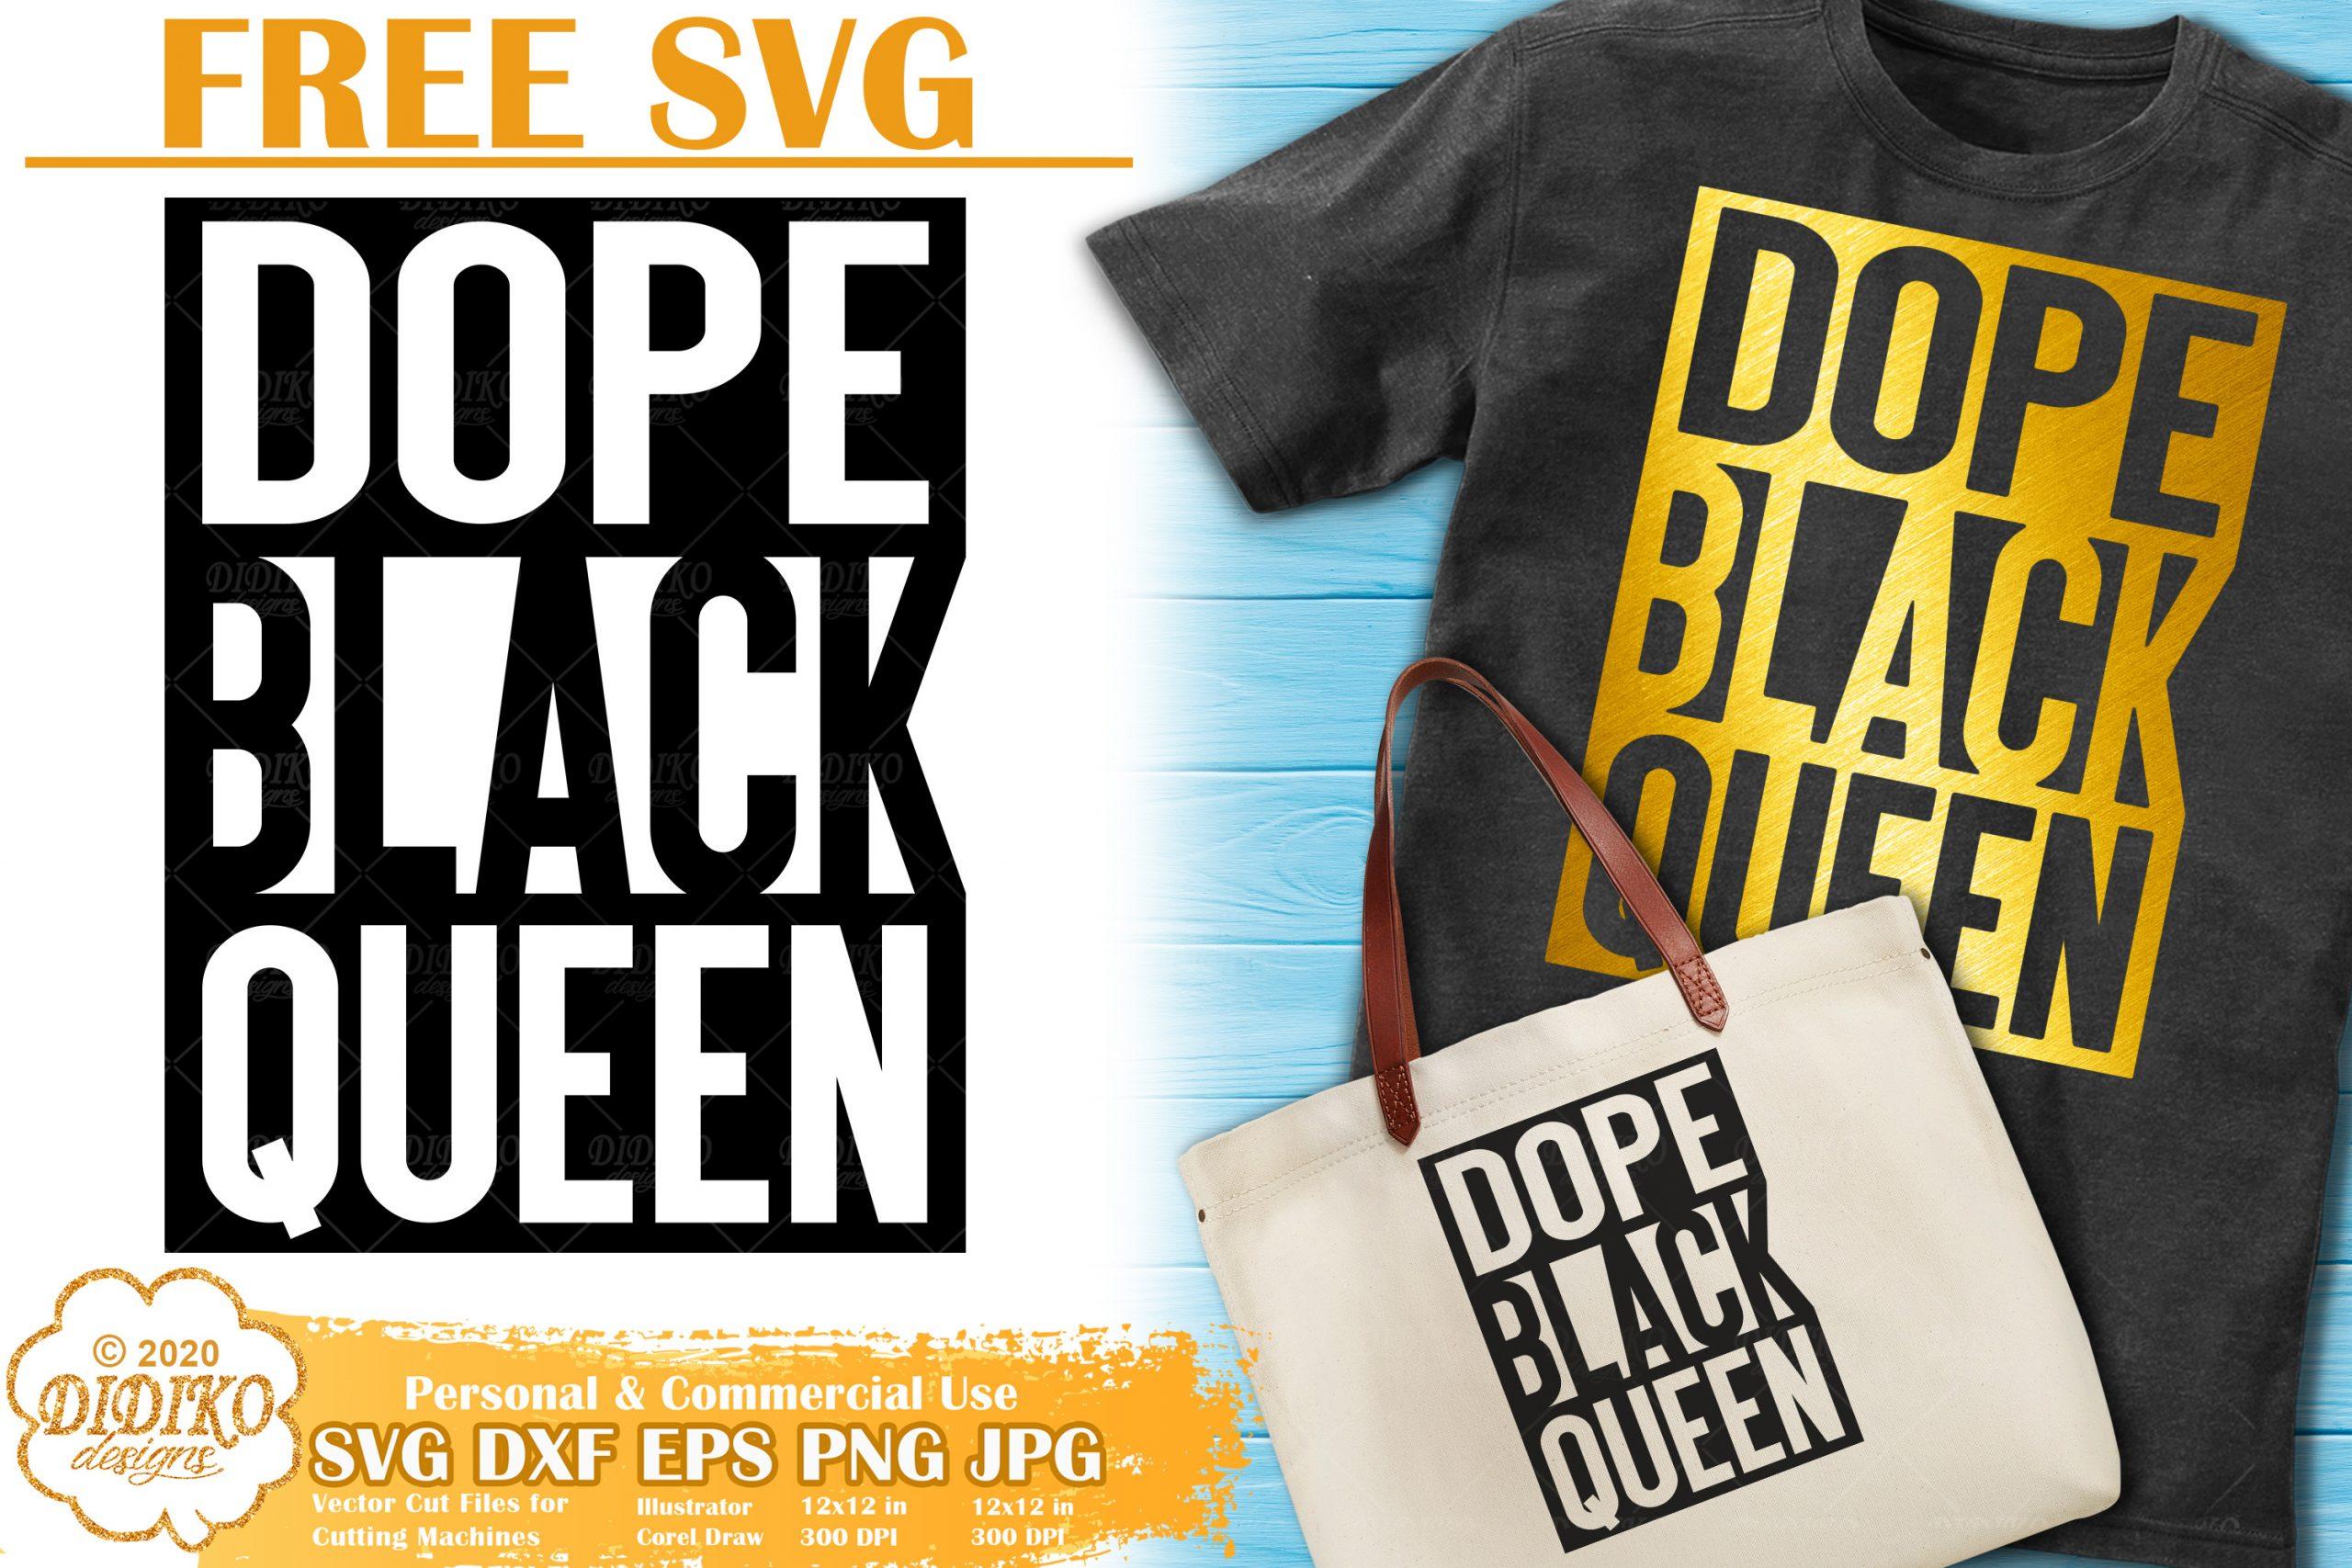 Download Black Queen SVG Free | Black Woman Svg | Dope Svg | DIDIKO ...